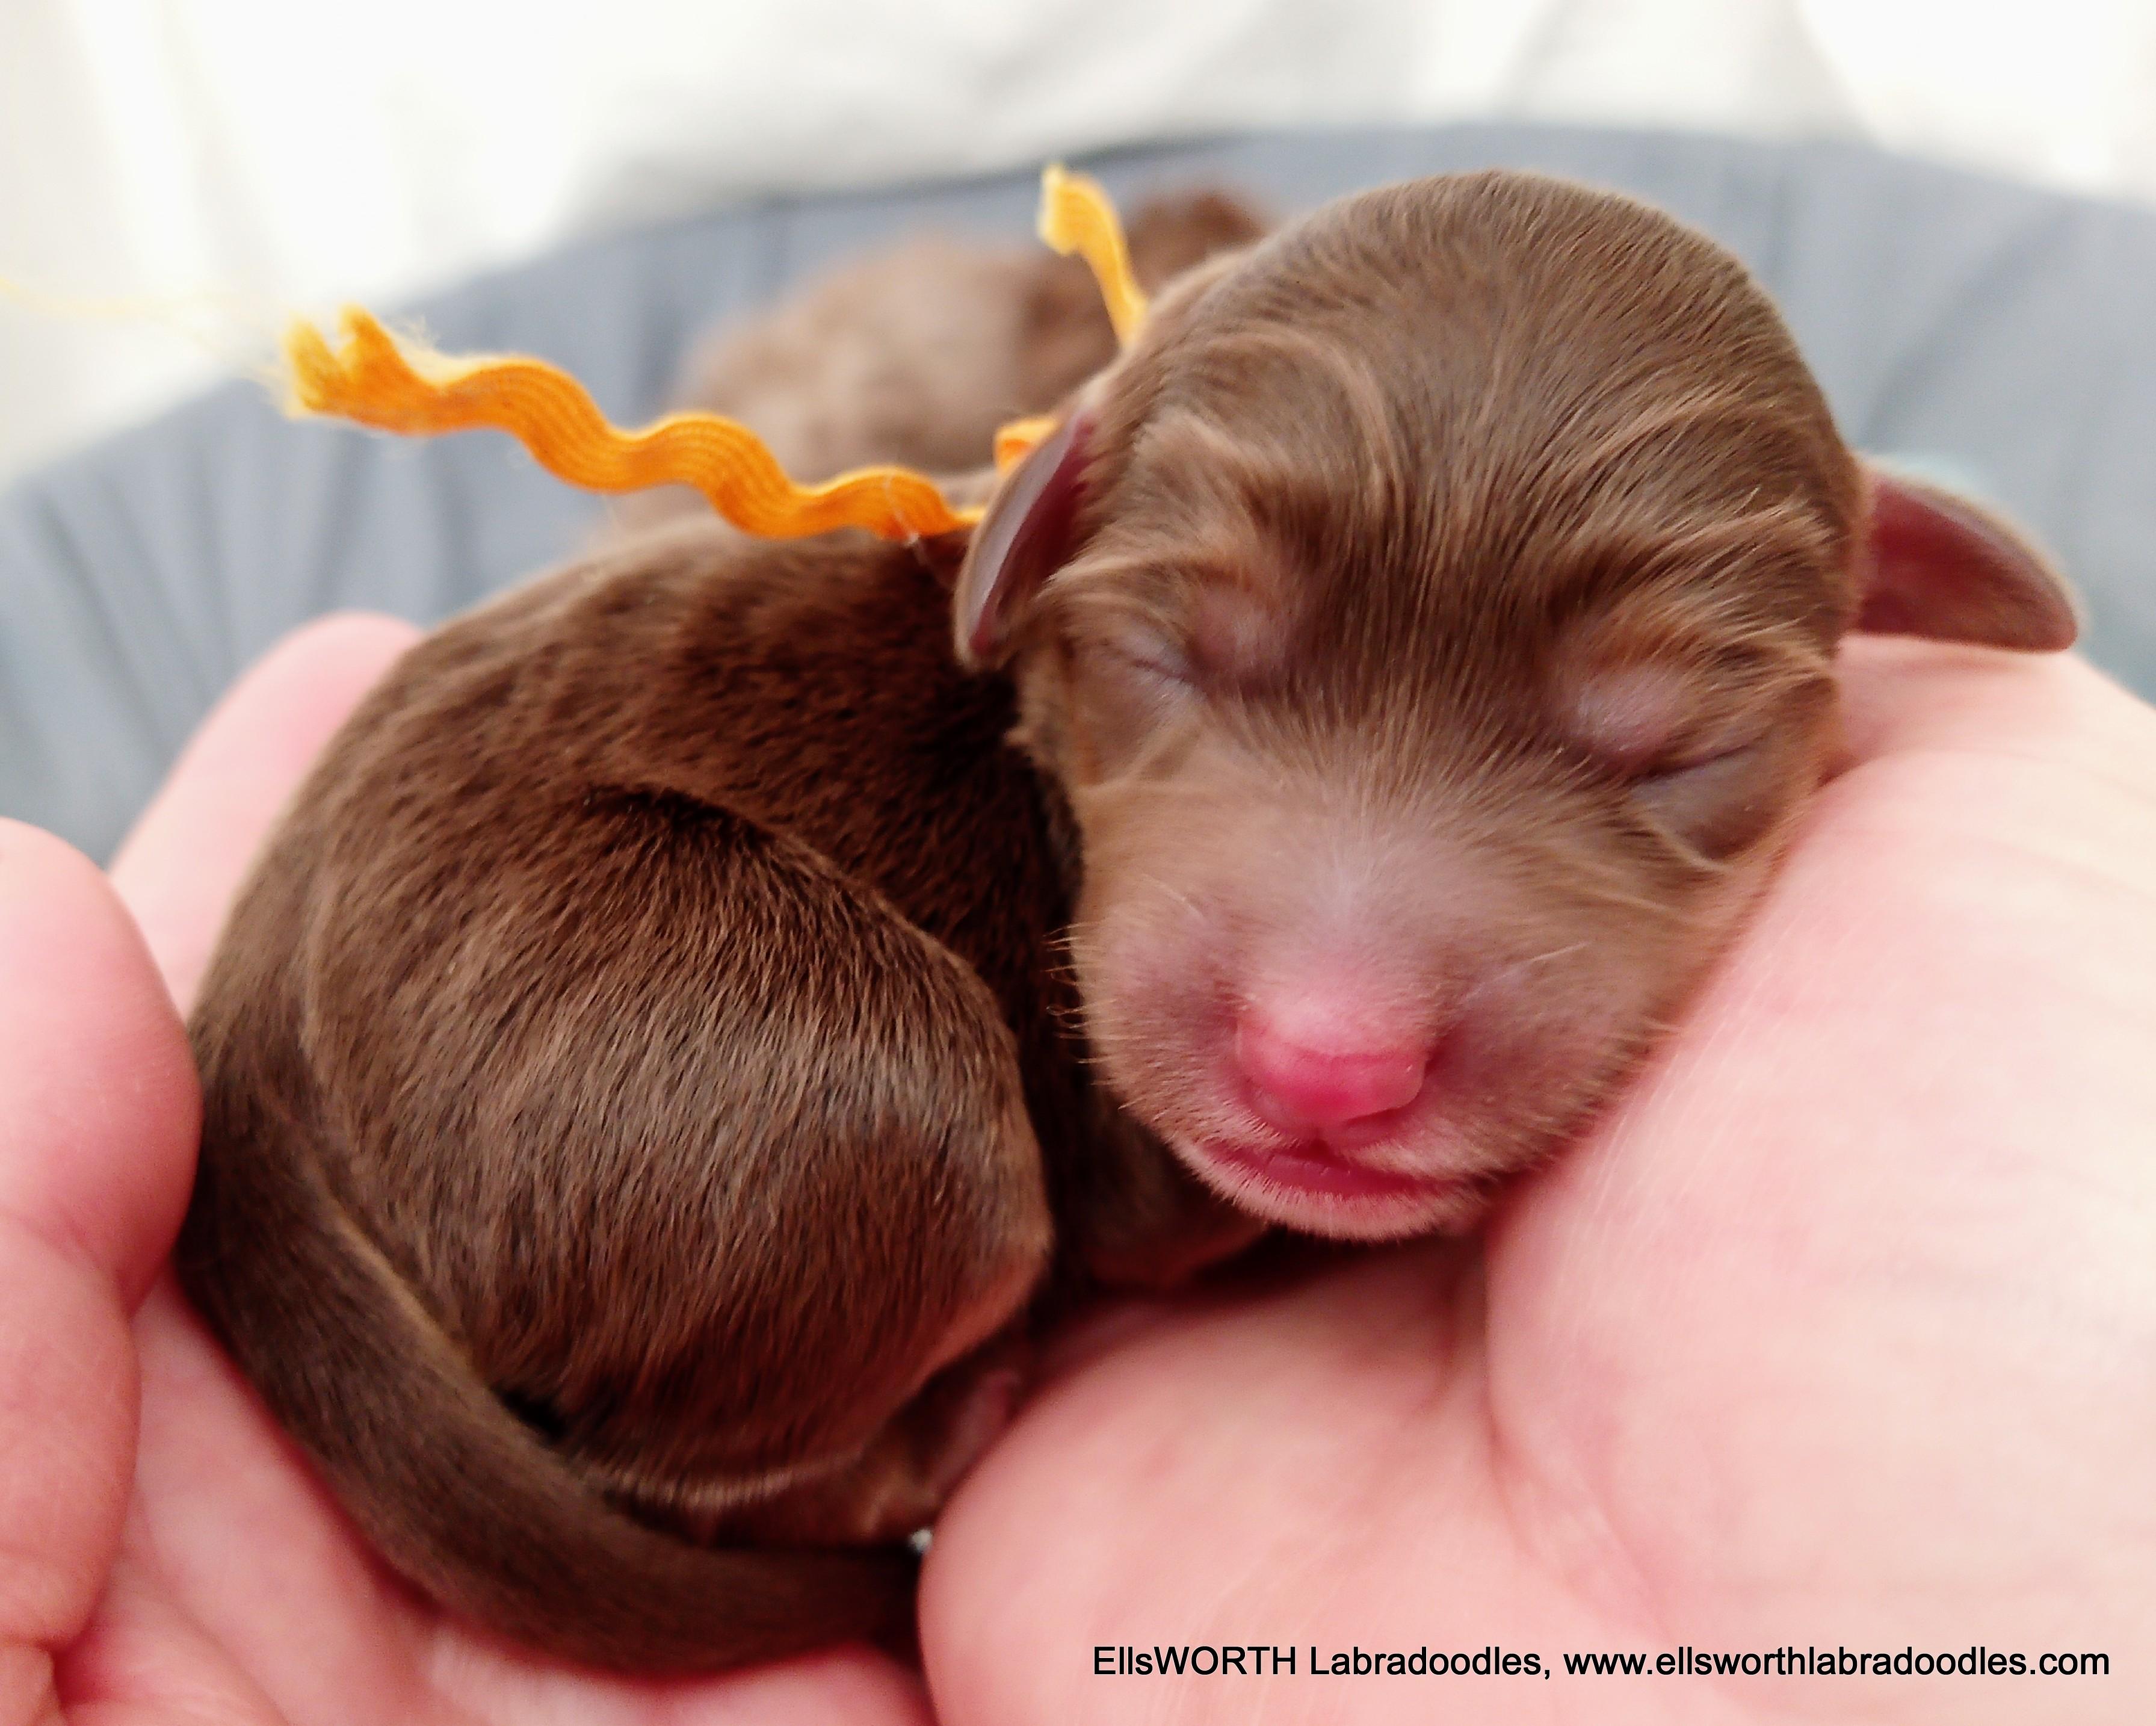 1st born  at 4:10 PM 8.1 oz